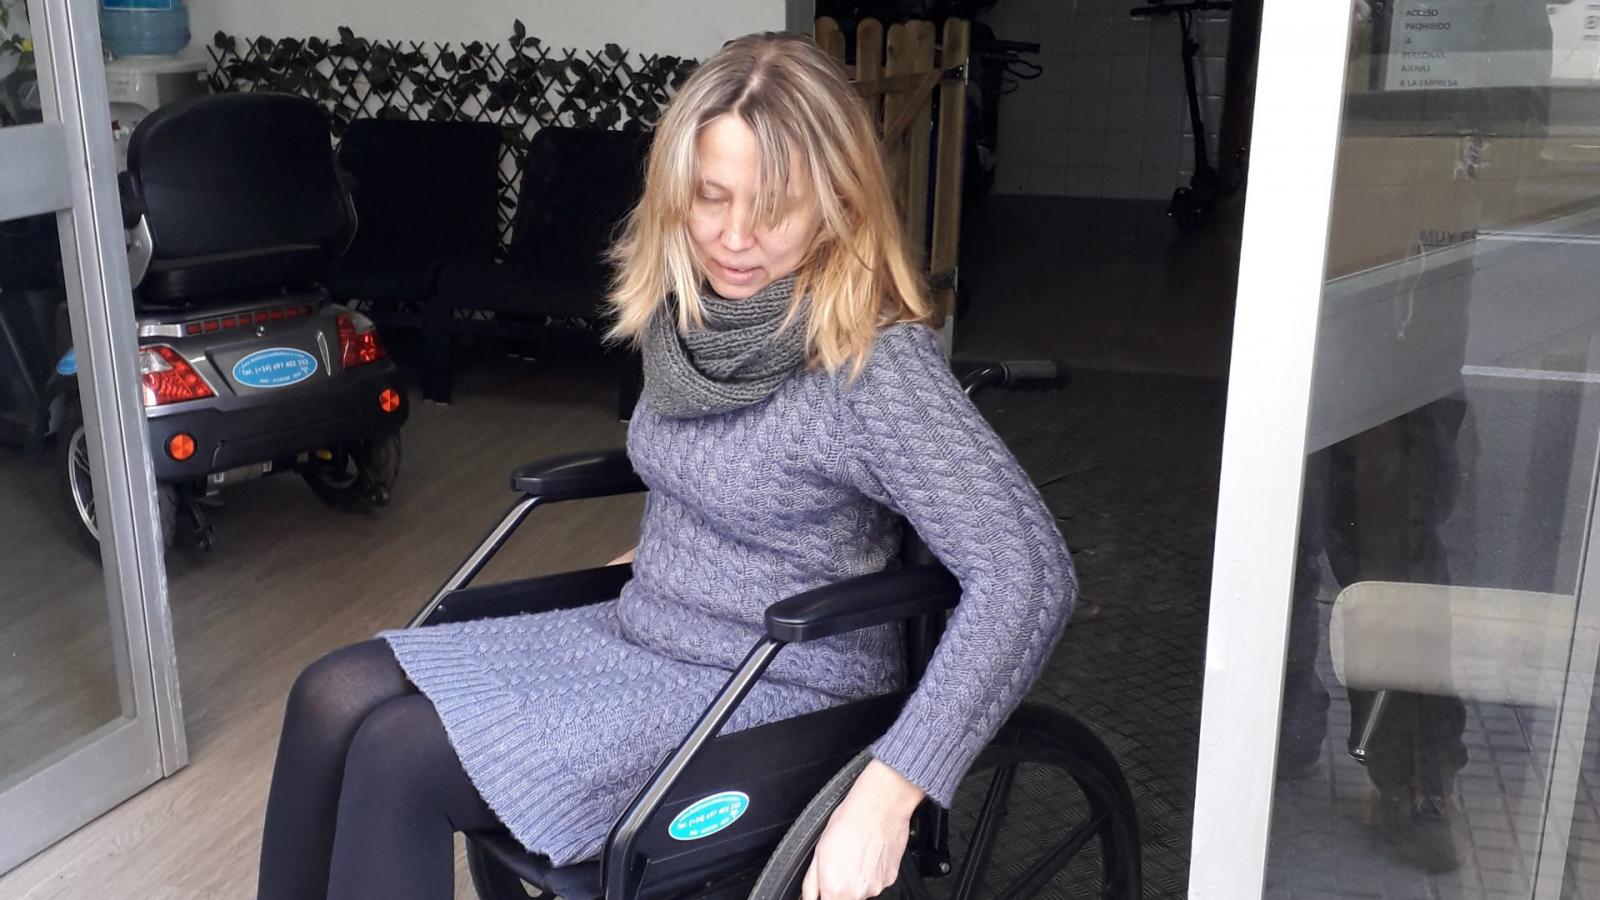 location de fauteuil roulant á Majorque